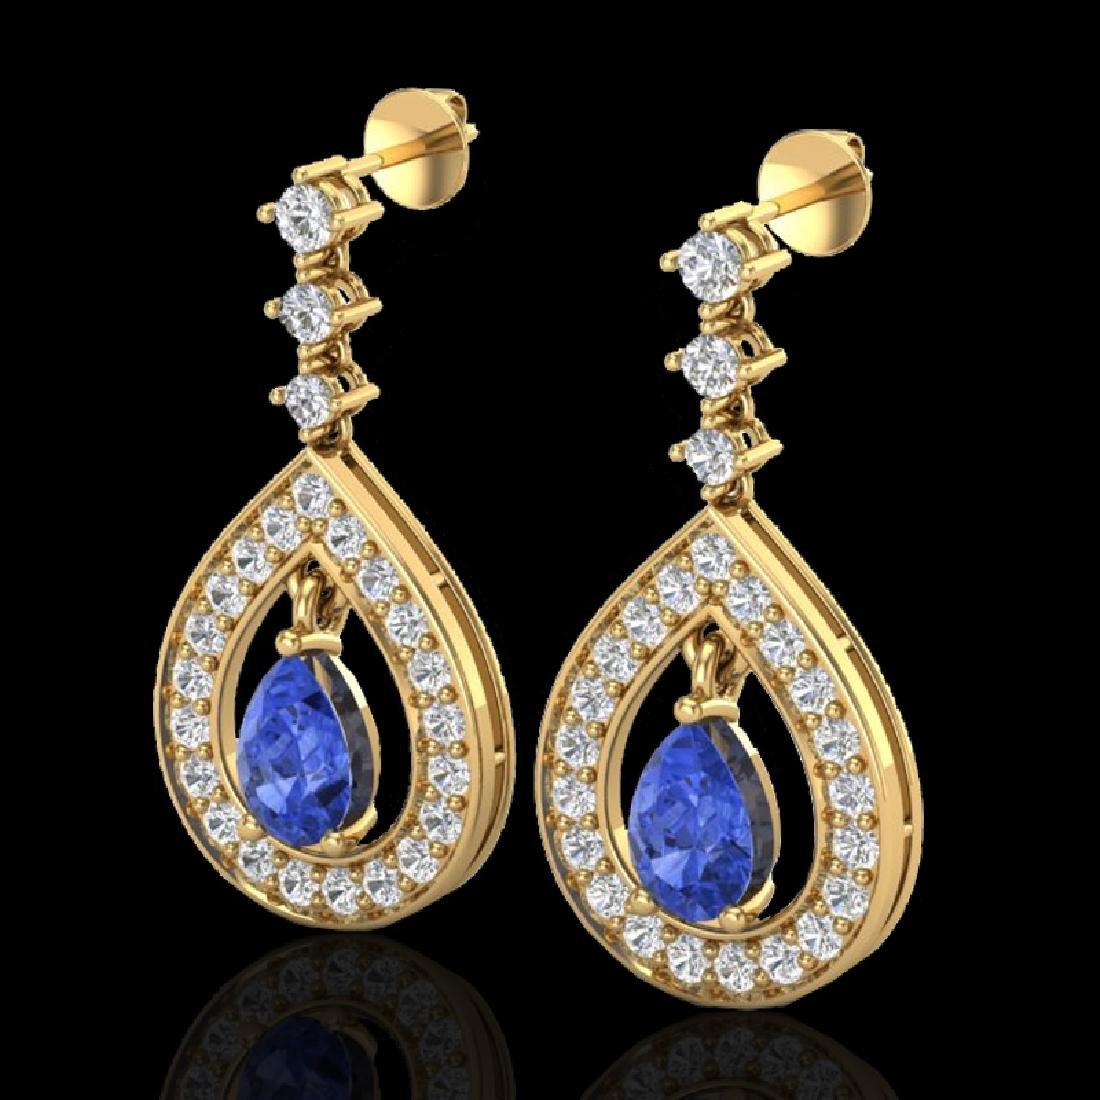 2.25 CTW Tanzanite & Micro Pave VS/SI Diamond Earrings